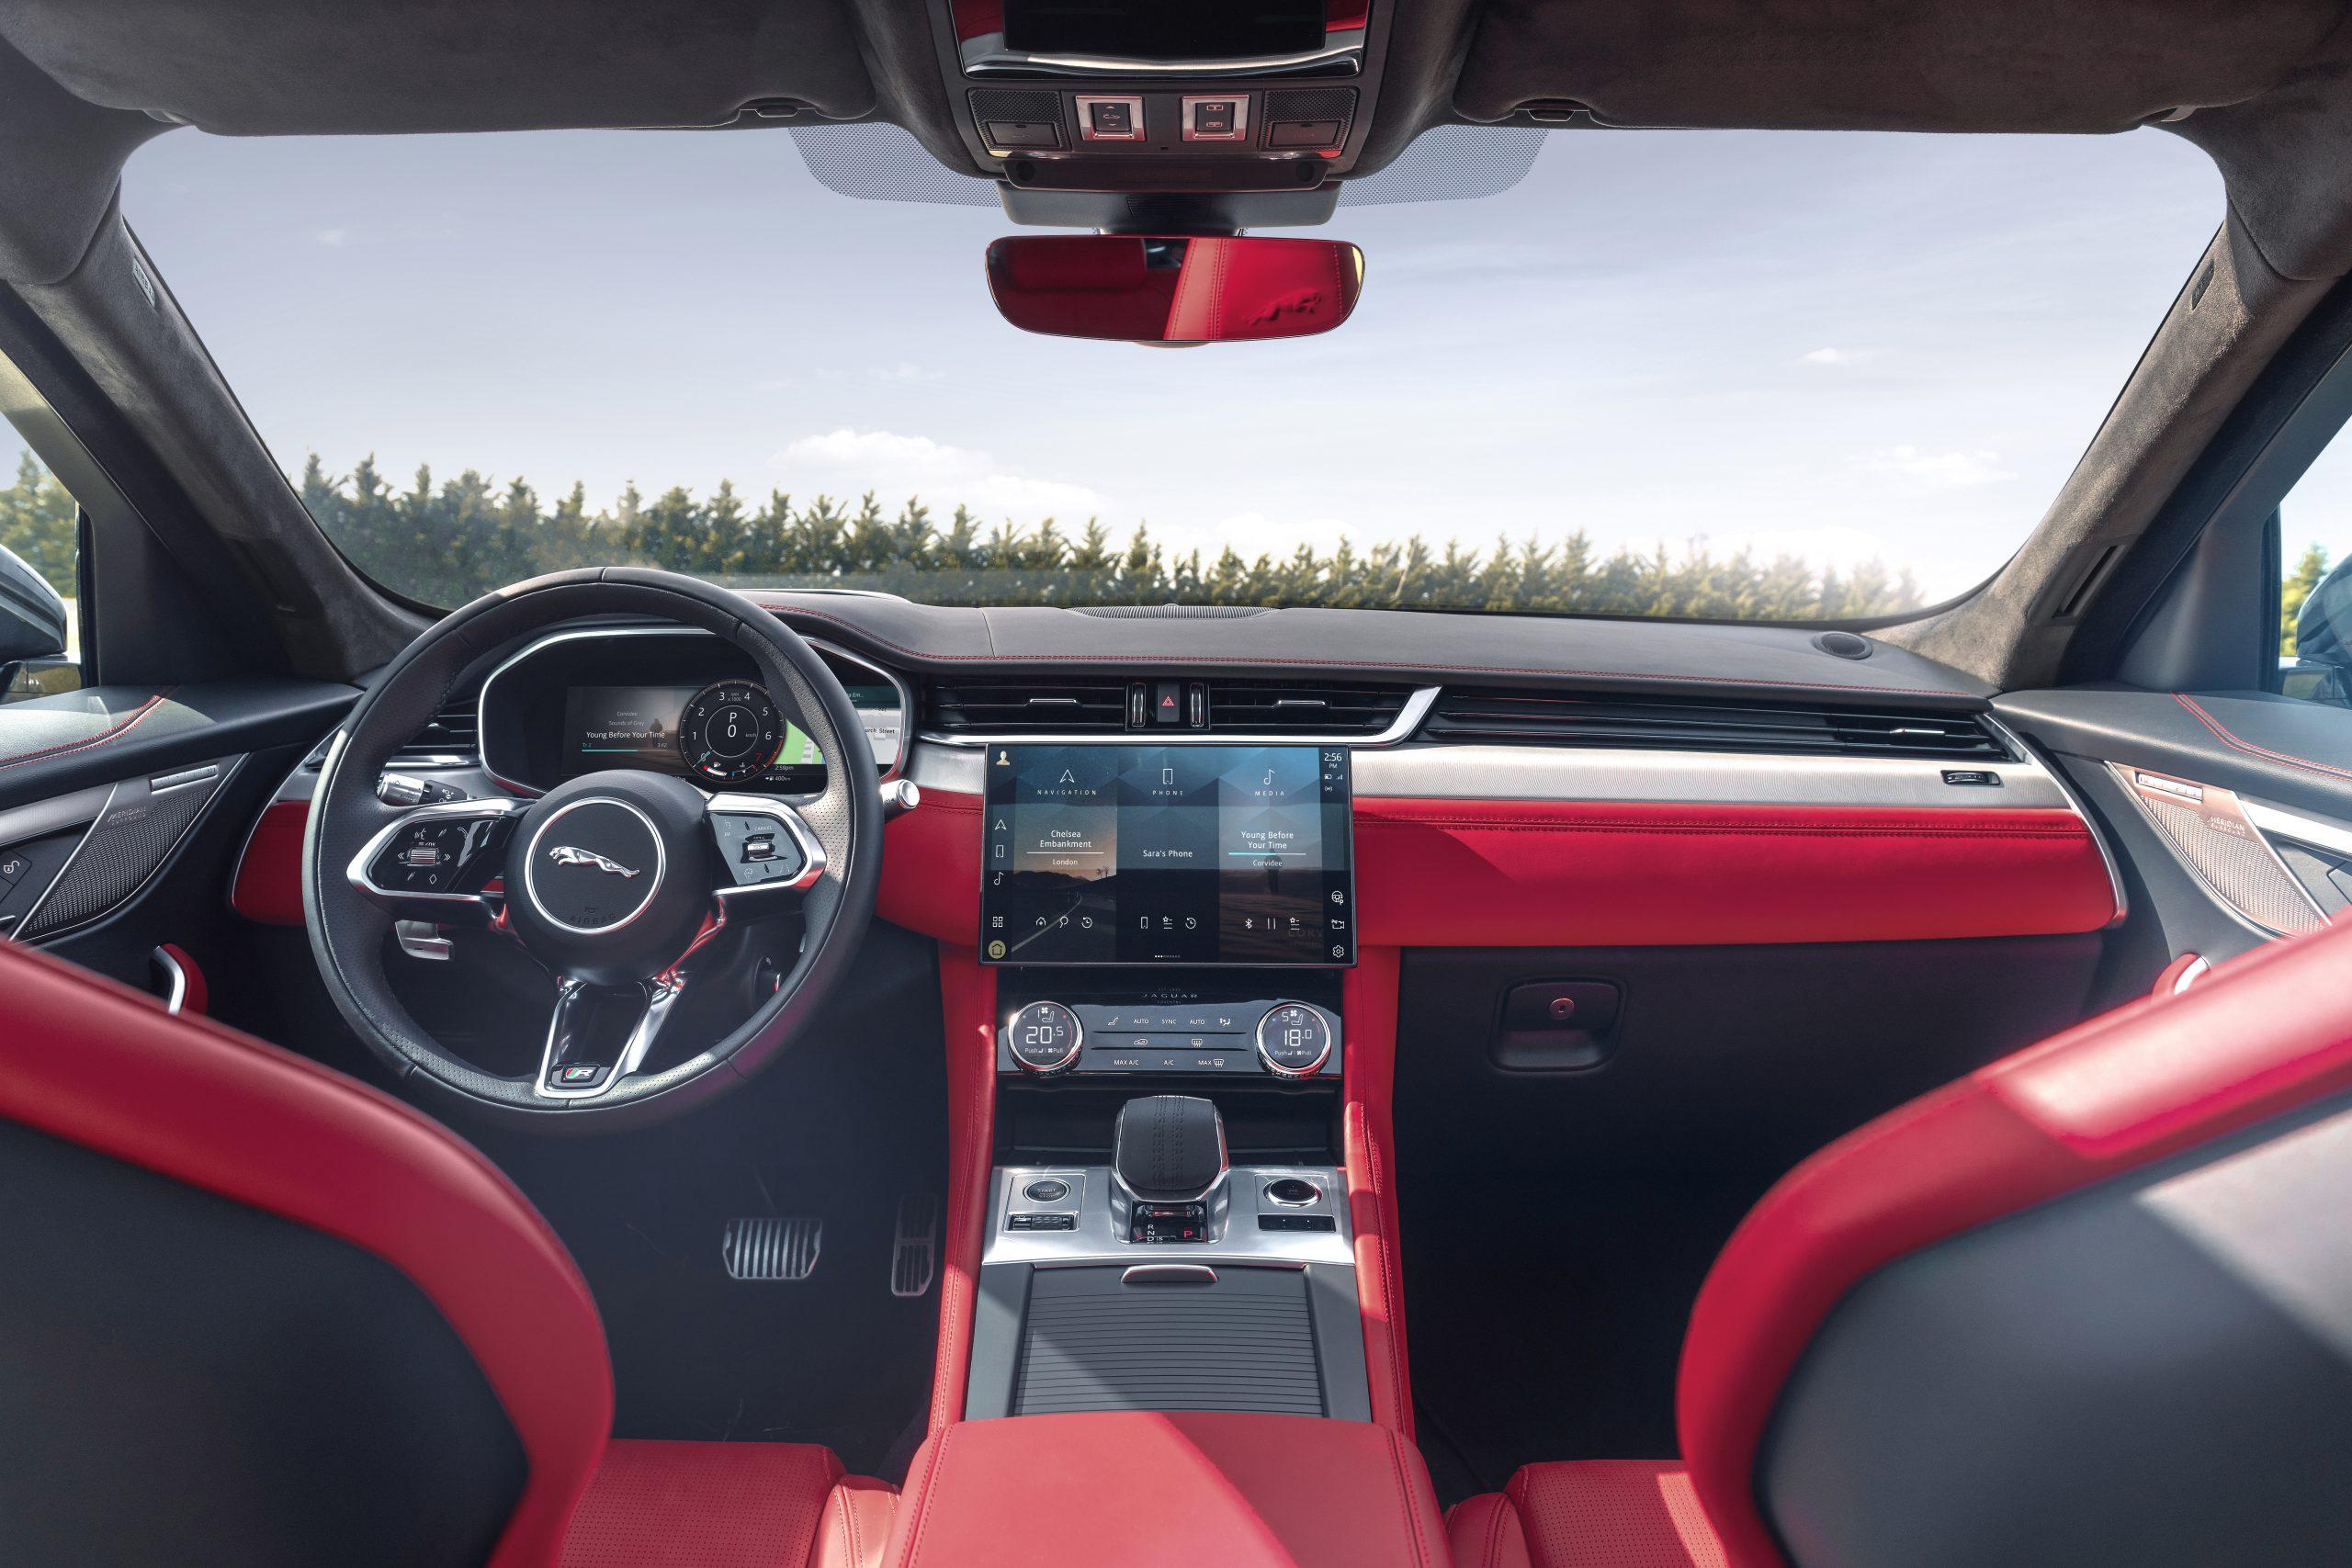 2021 Jaguar F-PACE interior center console